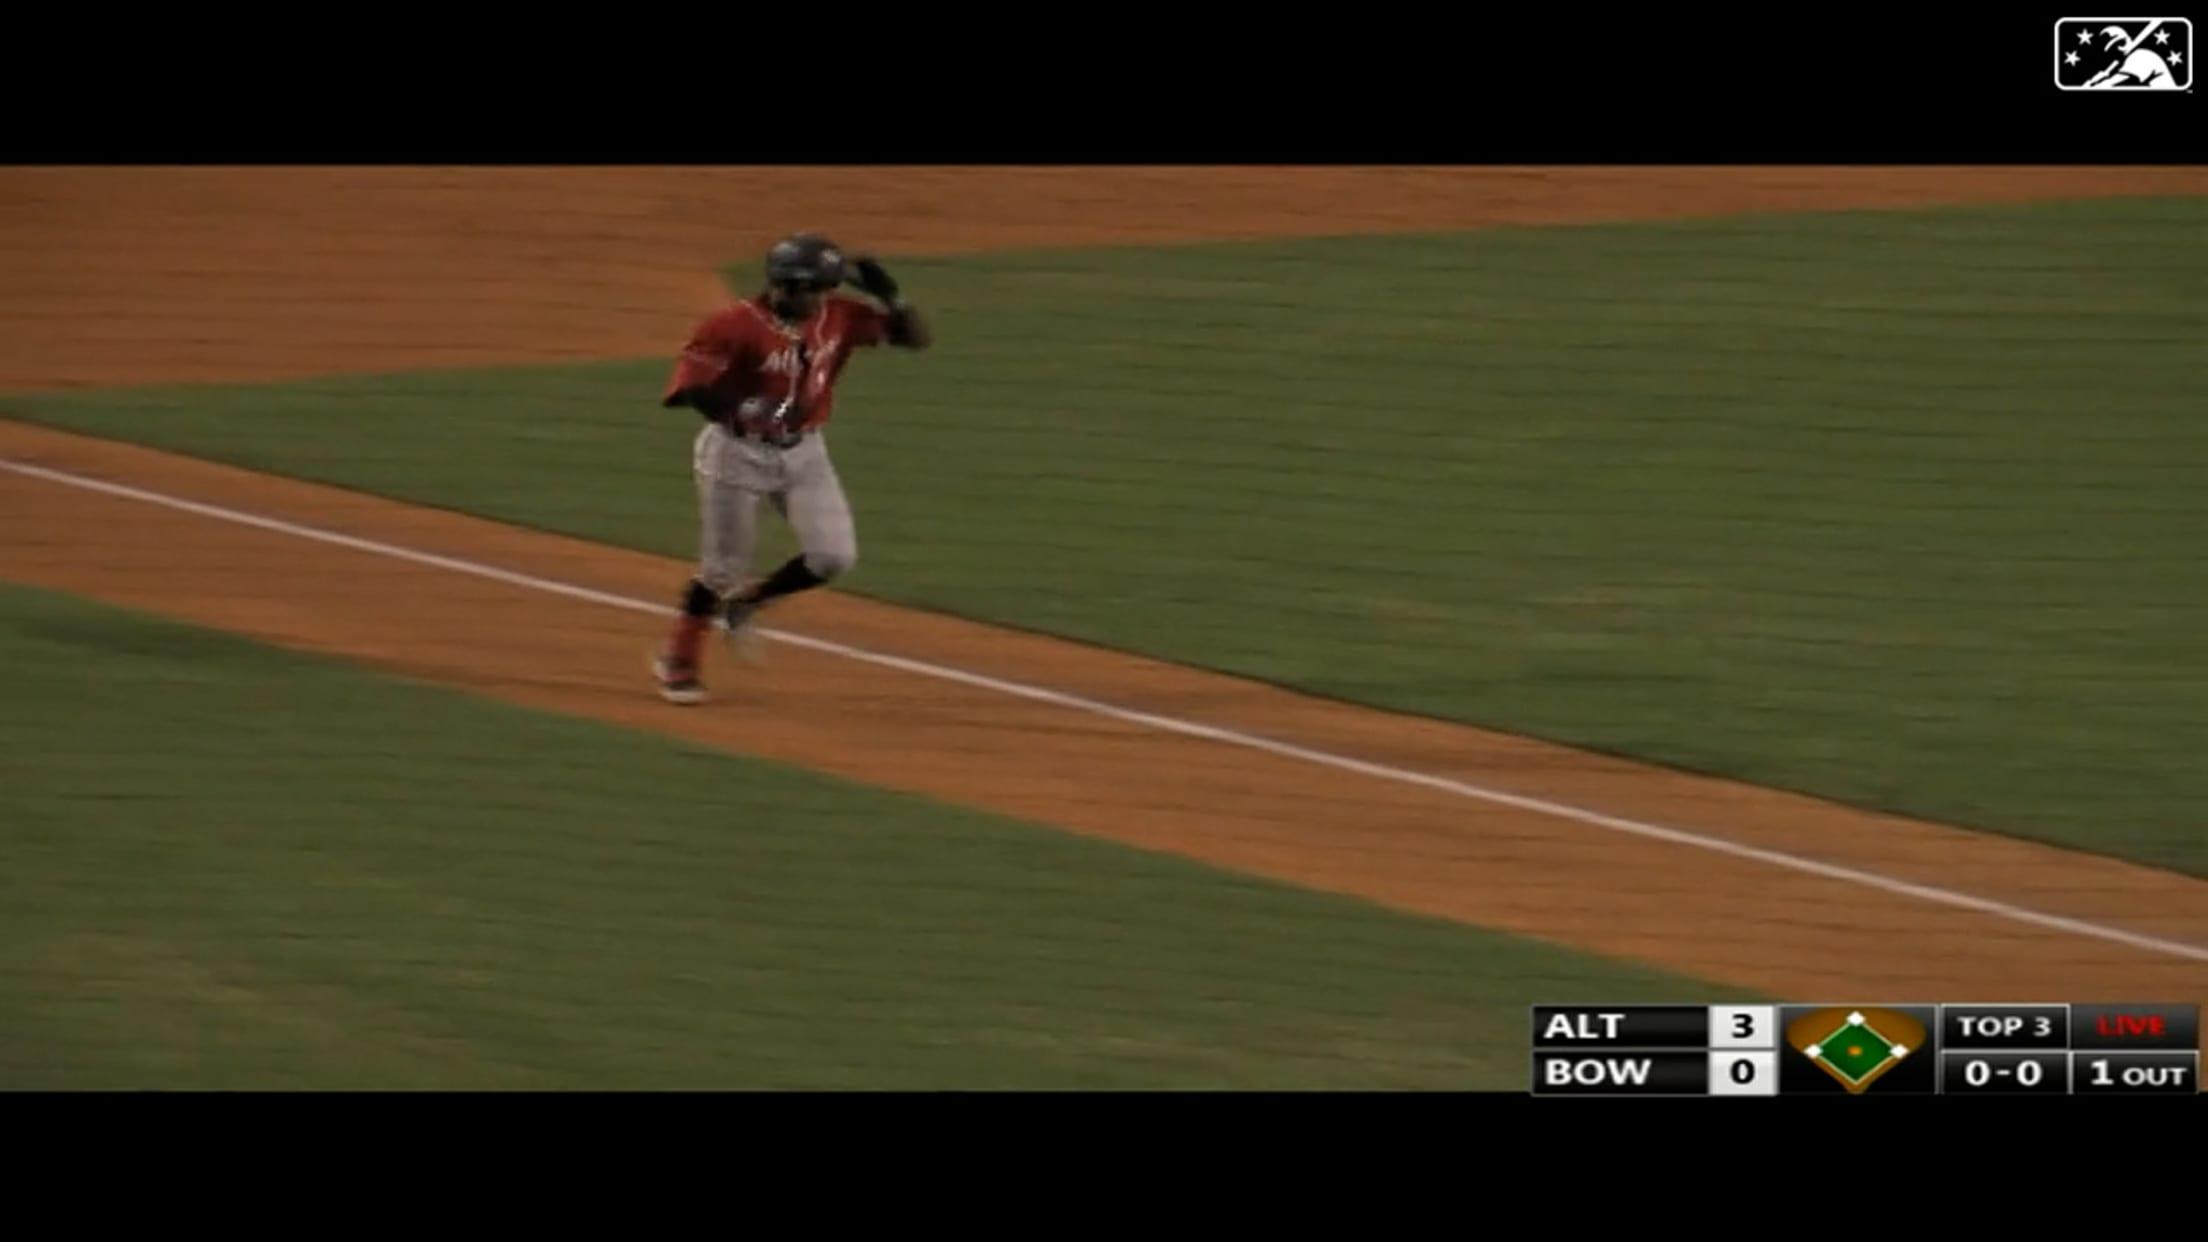 Cruz hits 12th Double-A homer